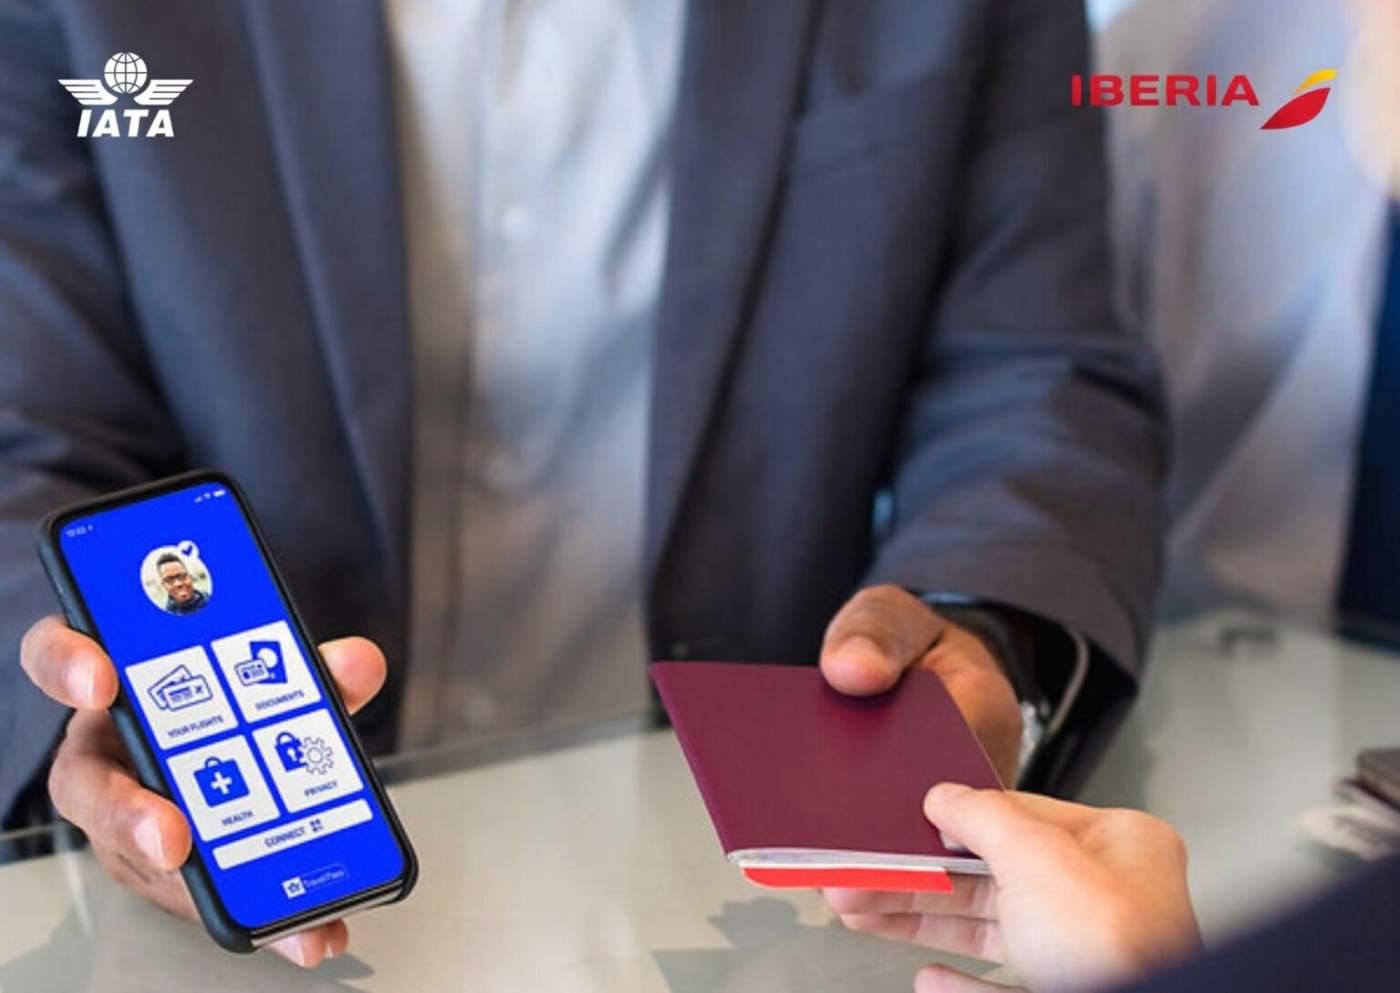 IATA Travel Passaporte Iberia